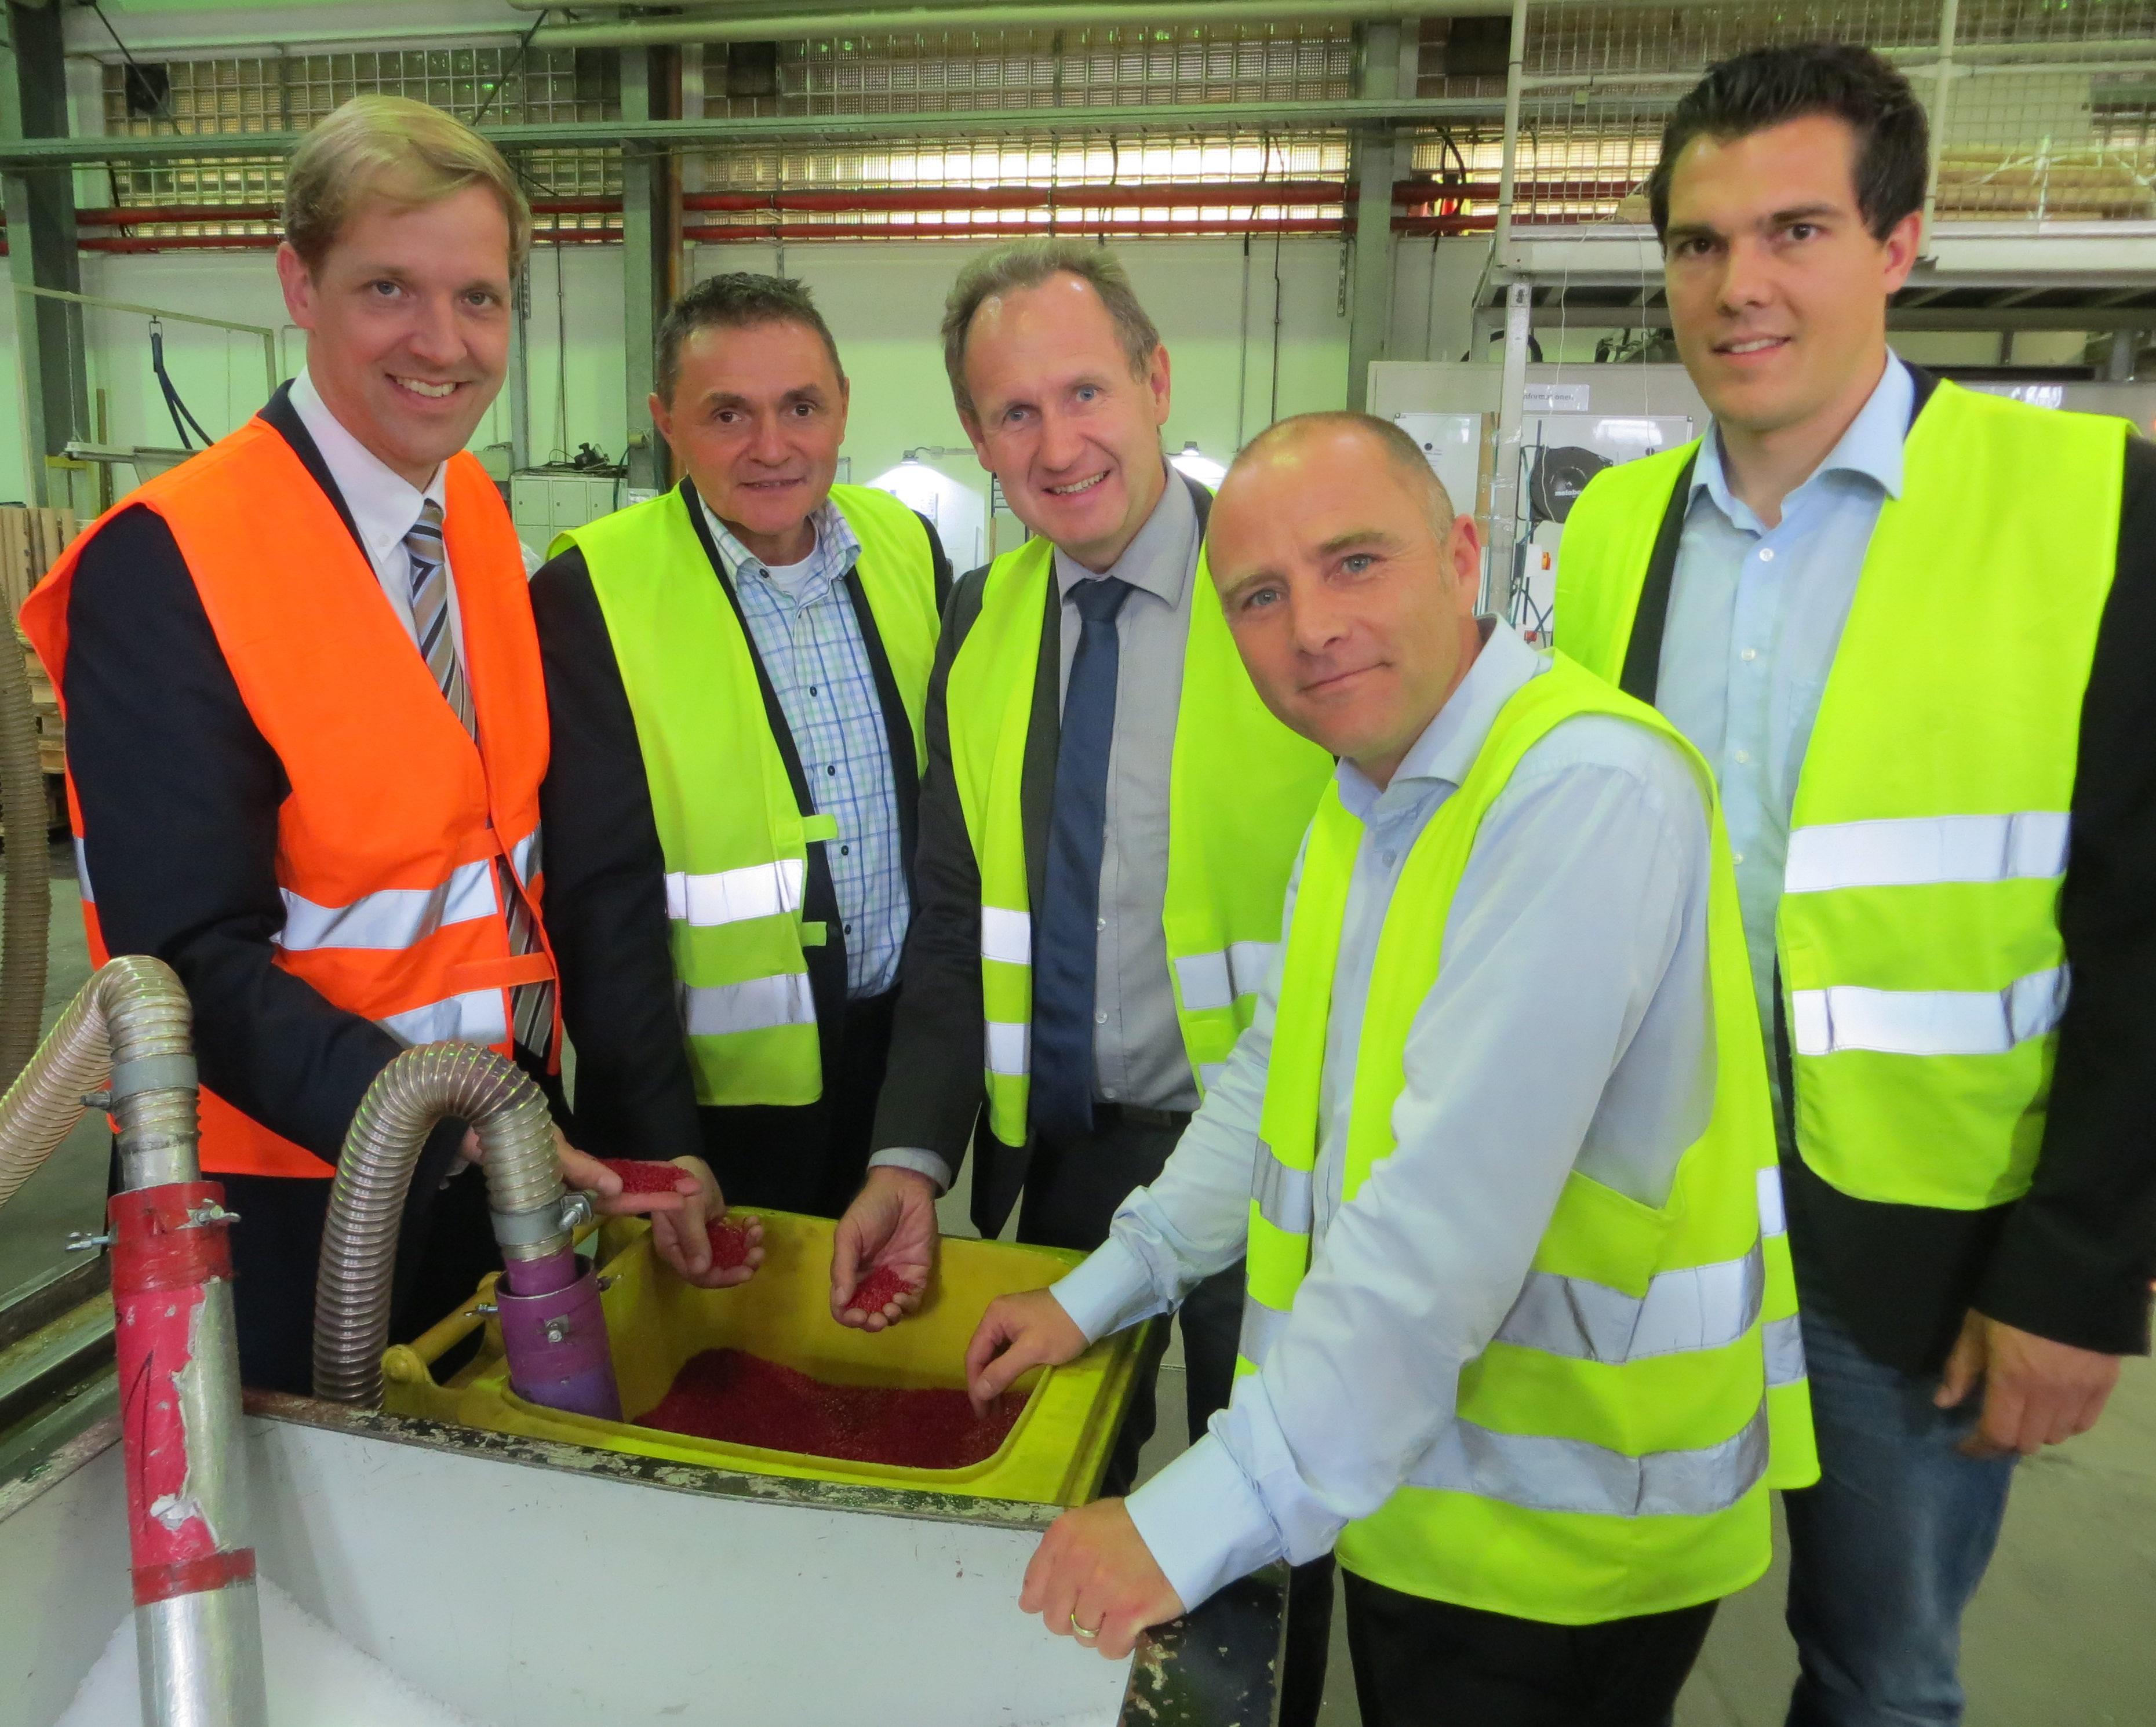 Landrat Dr. Christian Schulze Pellengahr besucht die CaPlast GmbH